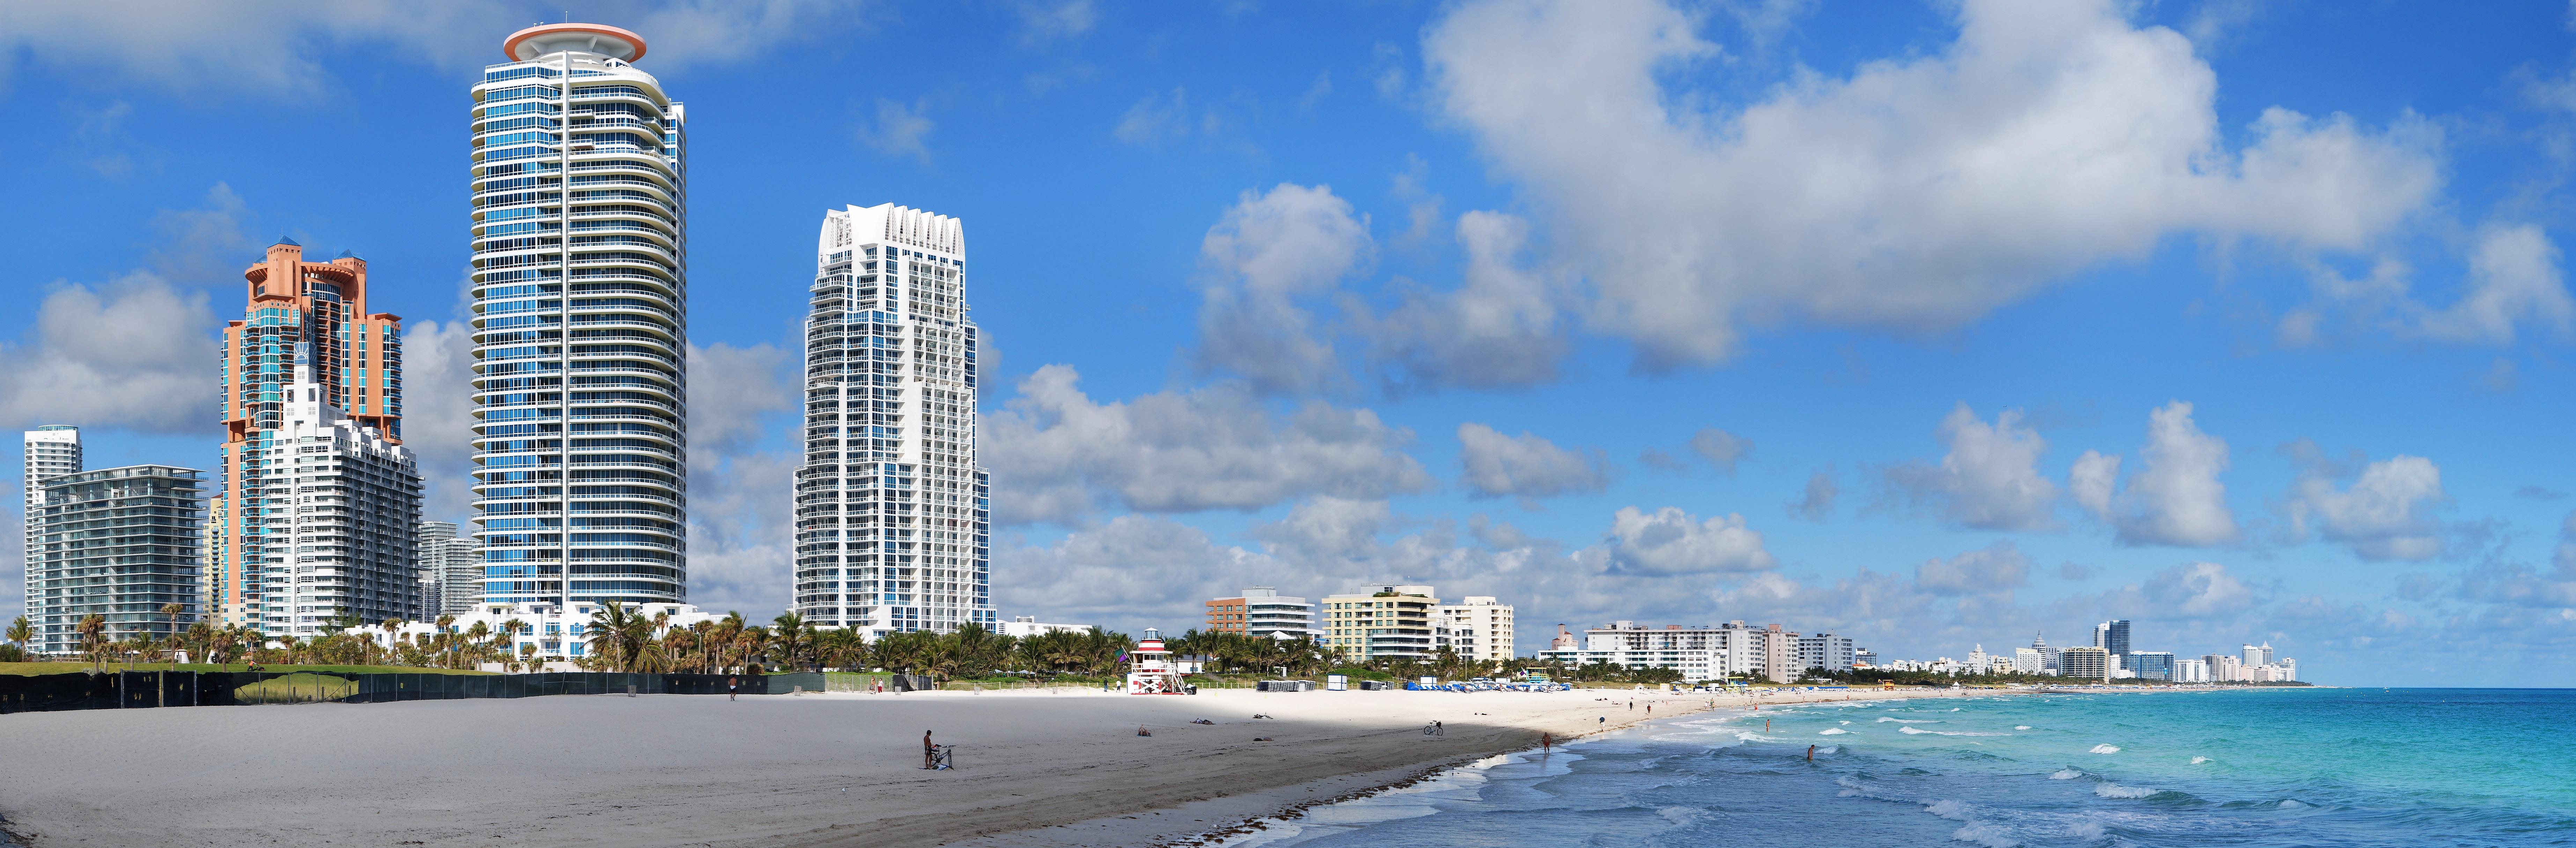 miami south beach panorama. Black Bedroom Furniture Sets. Home Design Ideas